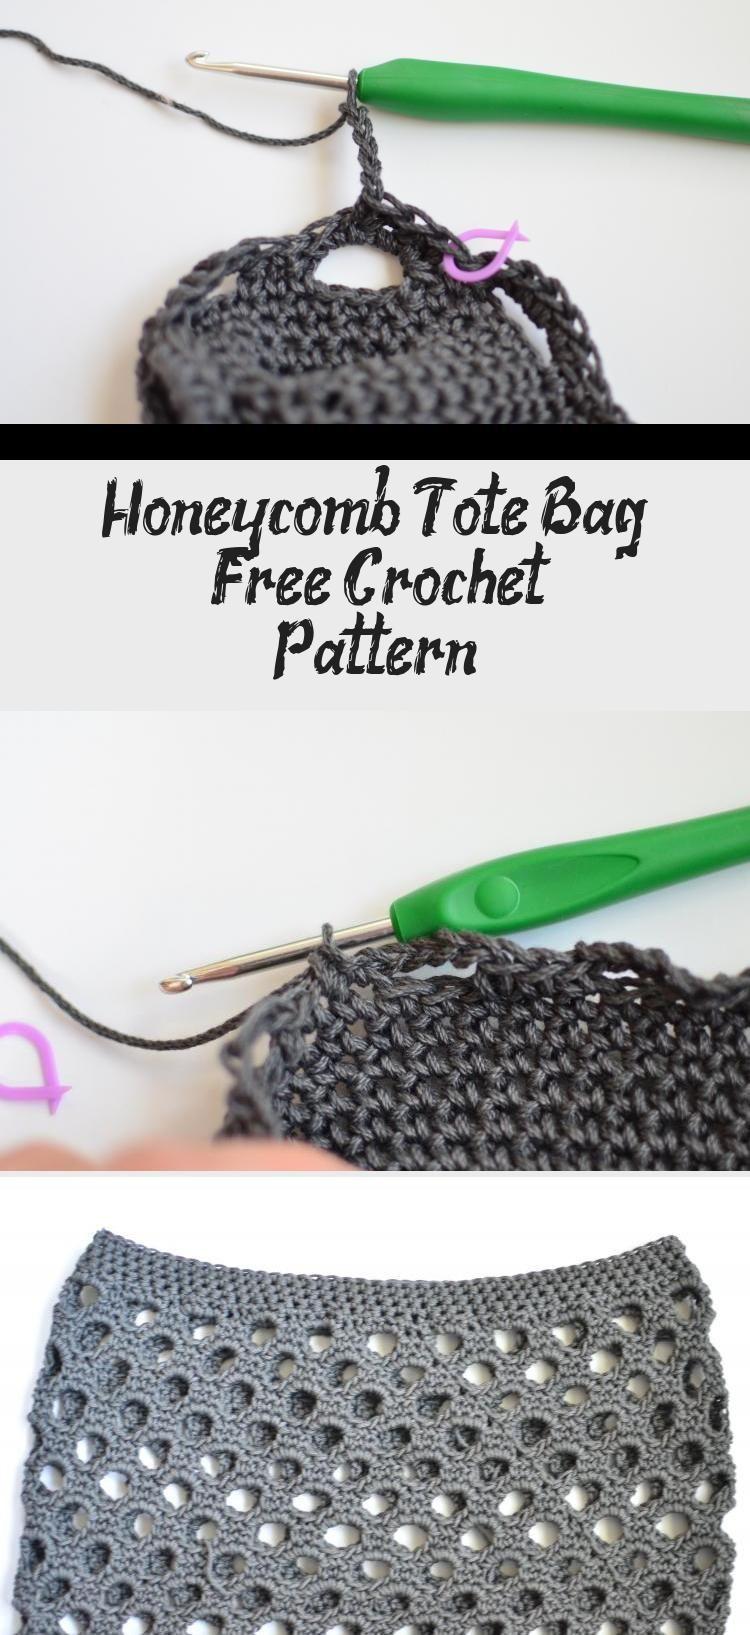 Honeycomb Tote Bag  Free Crochet Pattern  crochetthat Honeycomb Tote Bag  Free Crochet Pattern  crochetthat